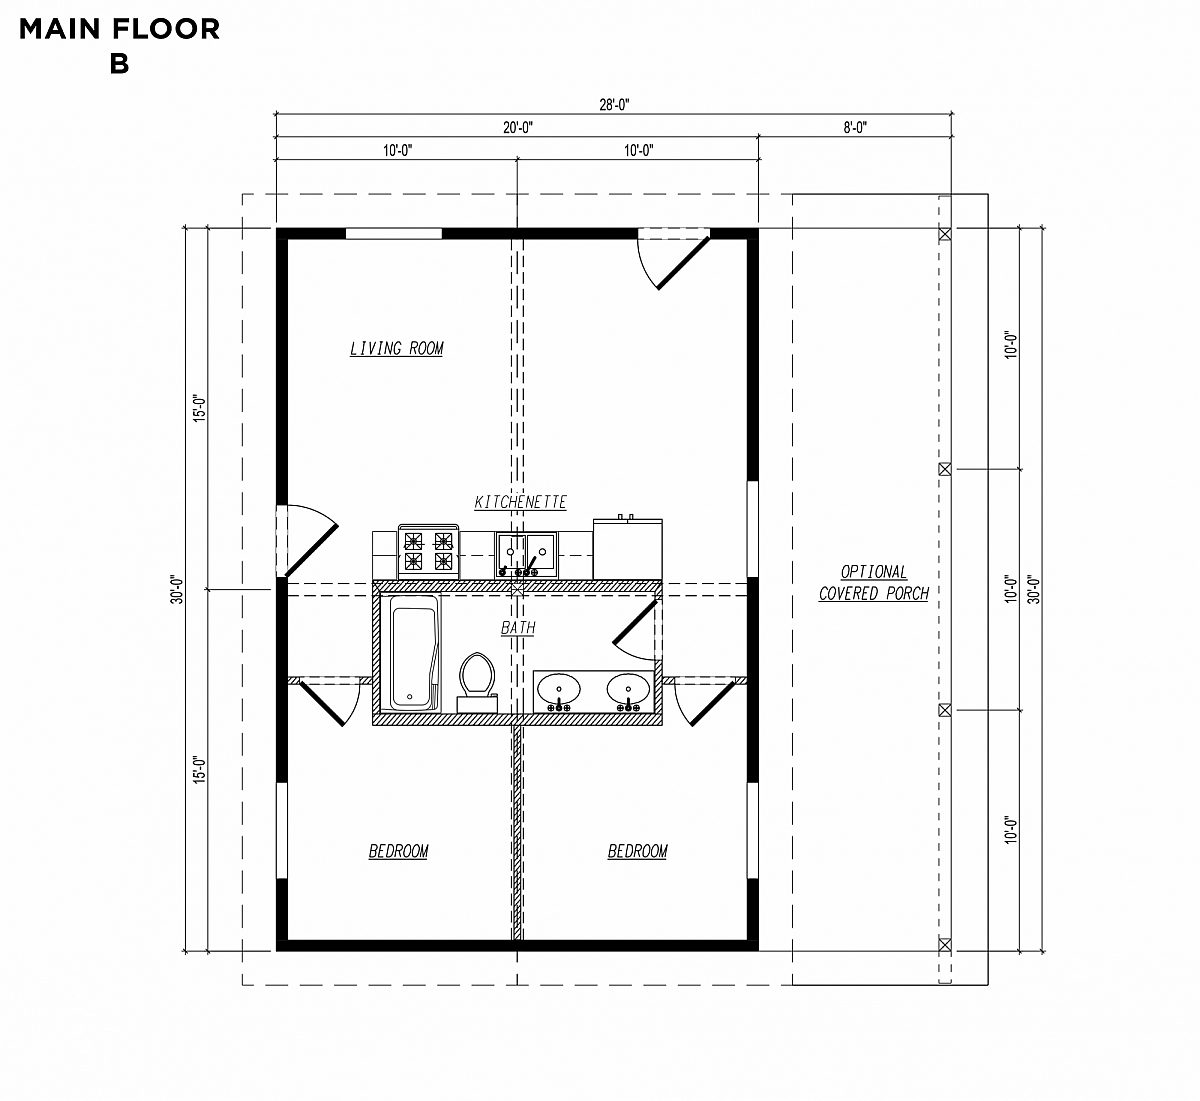 Timberlyne Sparrow Main Floor Plan B copy